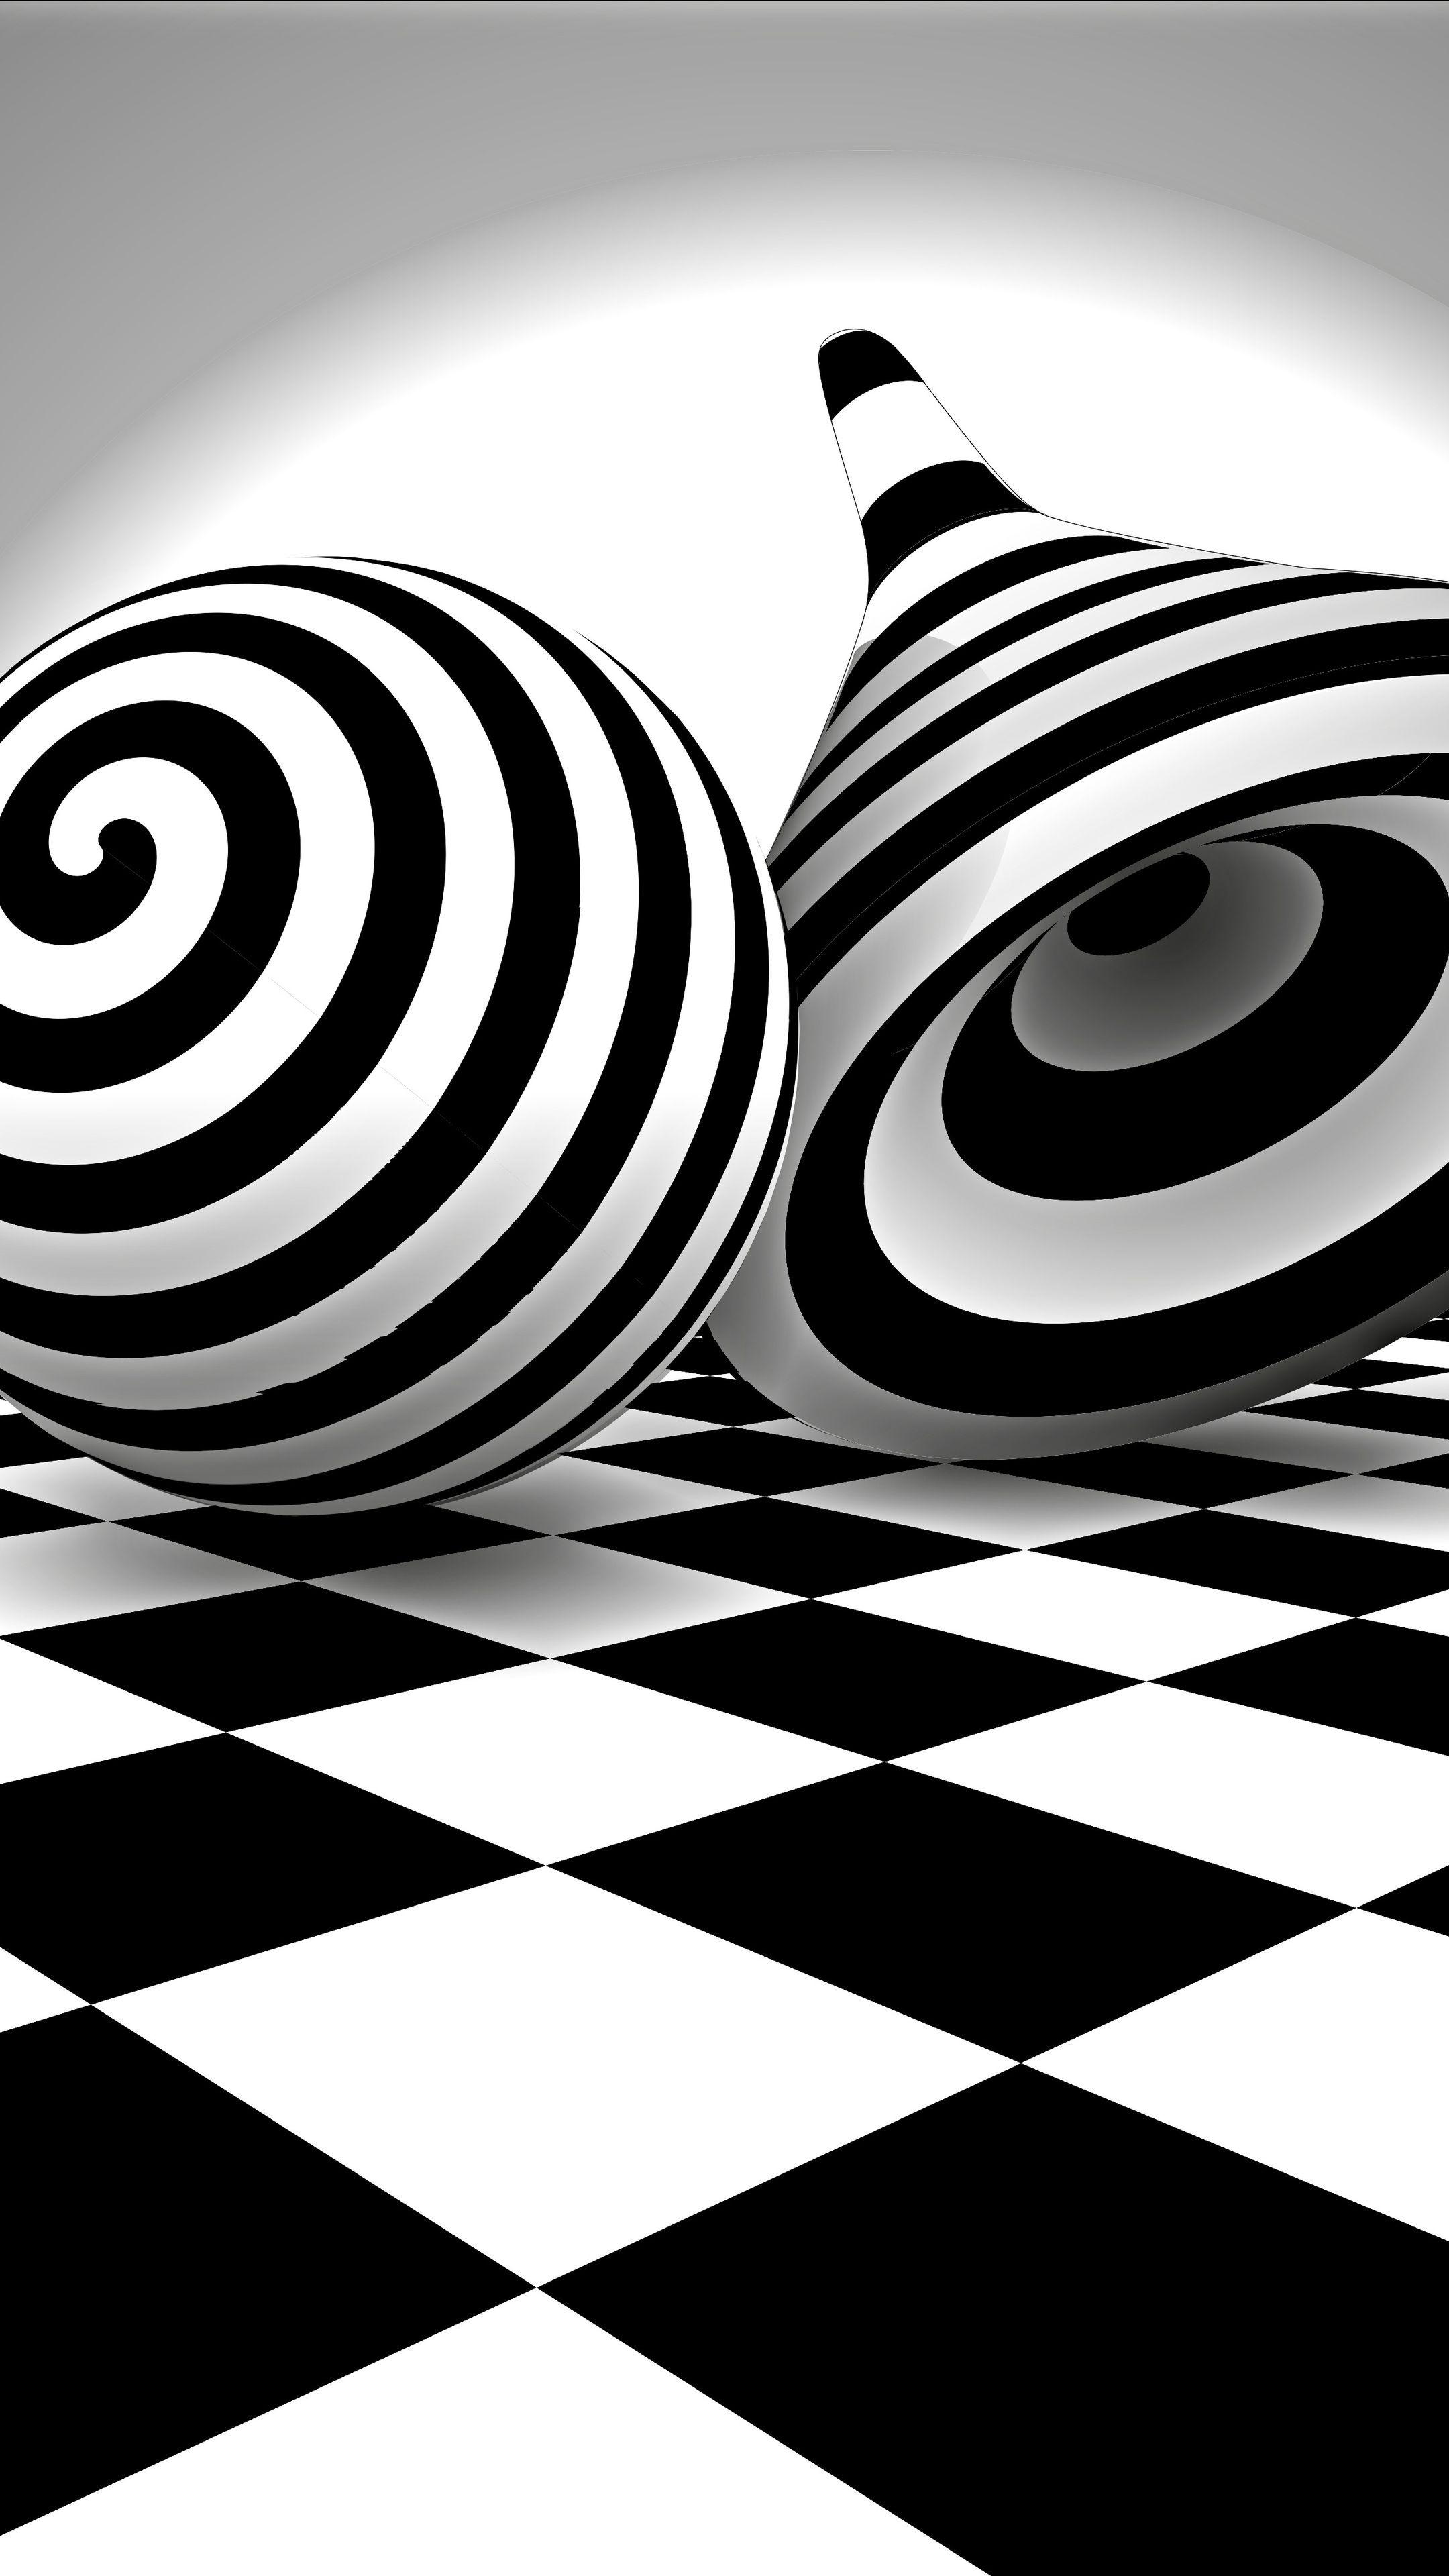 Misc Black White Optical Illusion Wallpapers Optical Illusions Illusions Phone Background Patterns